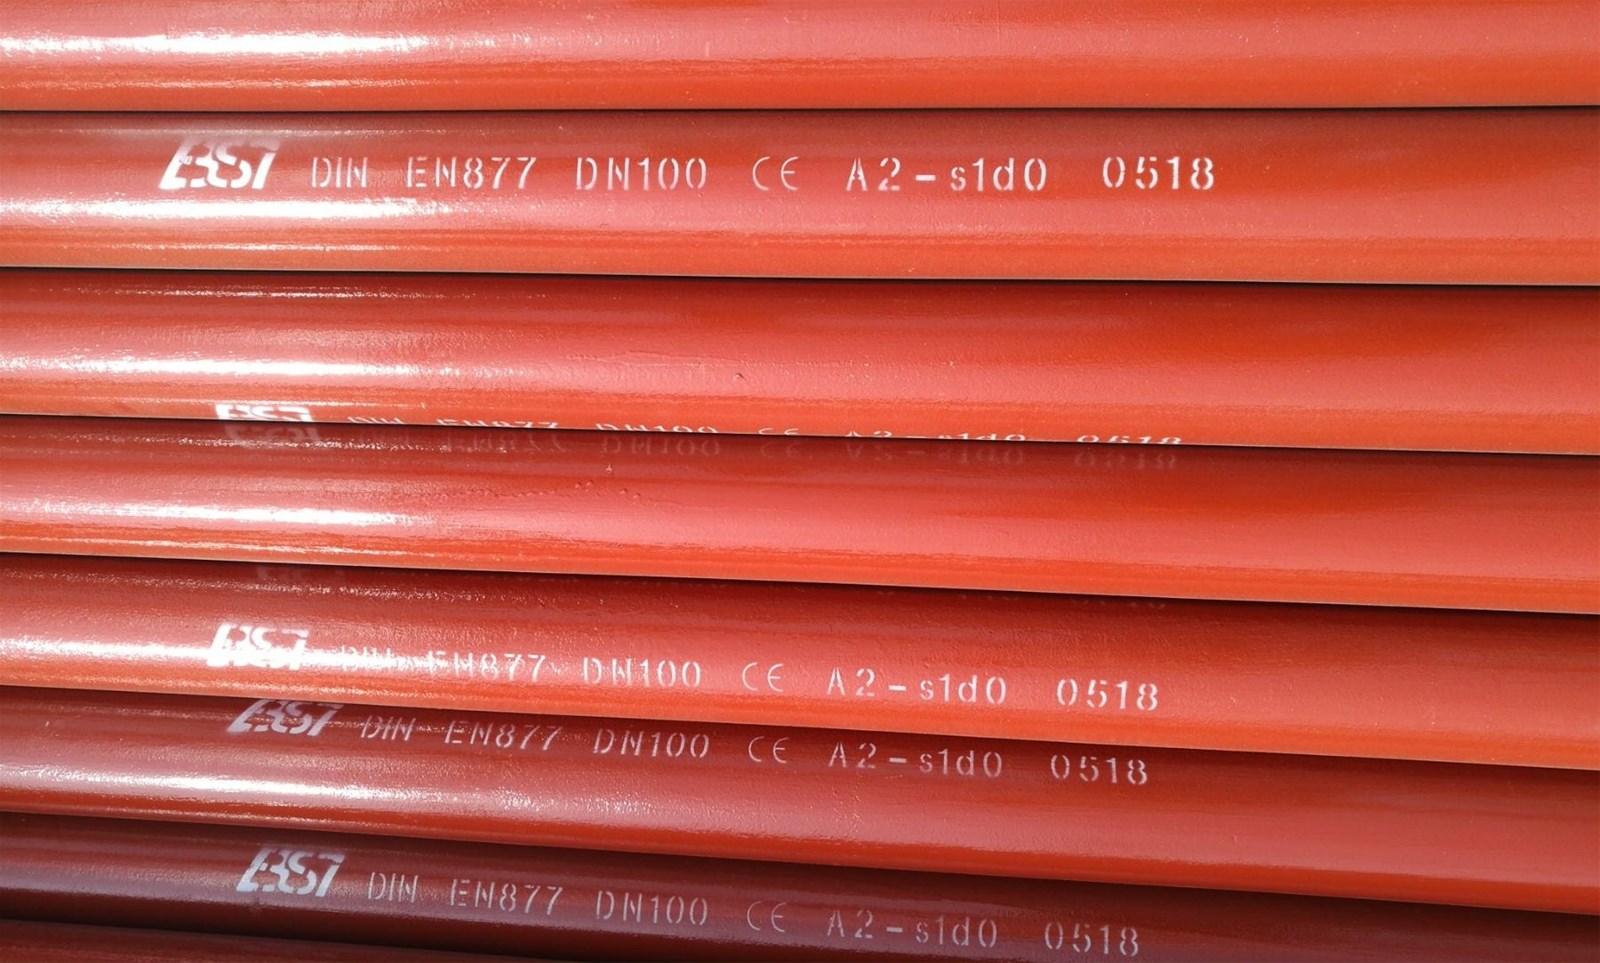 SML EN877 EPOXY CAST IRON PIPE FITTING